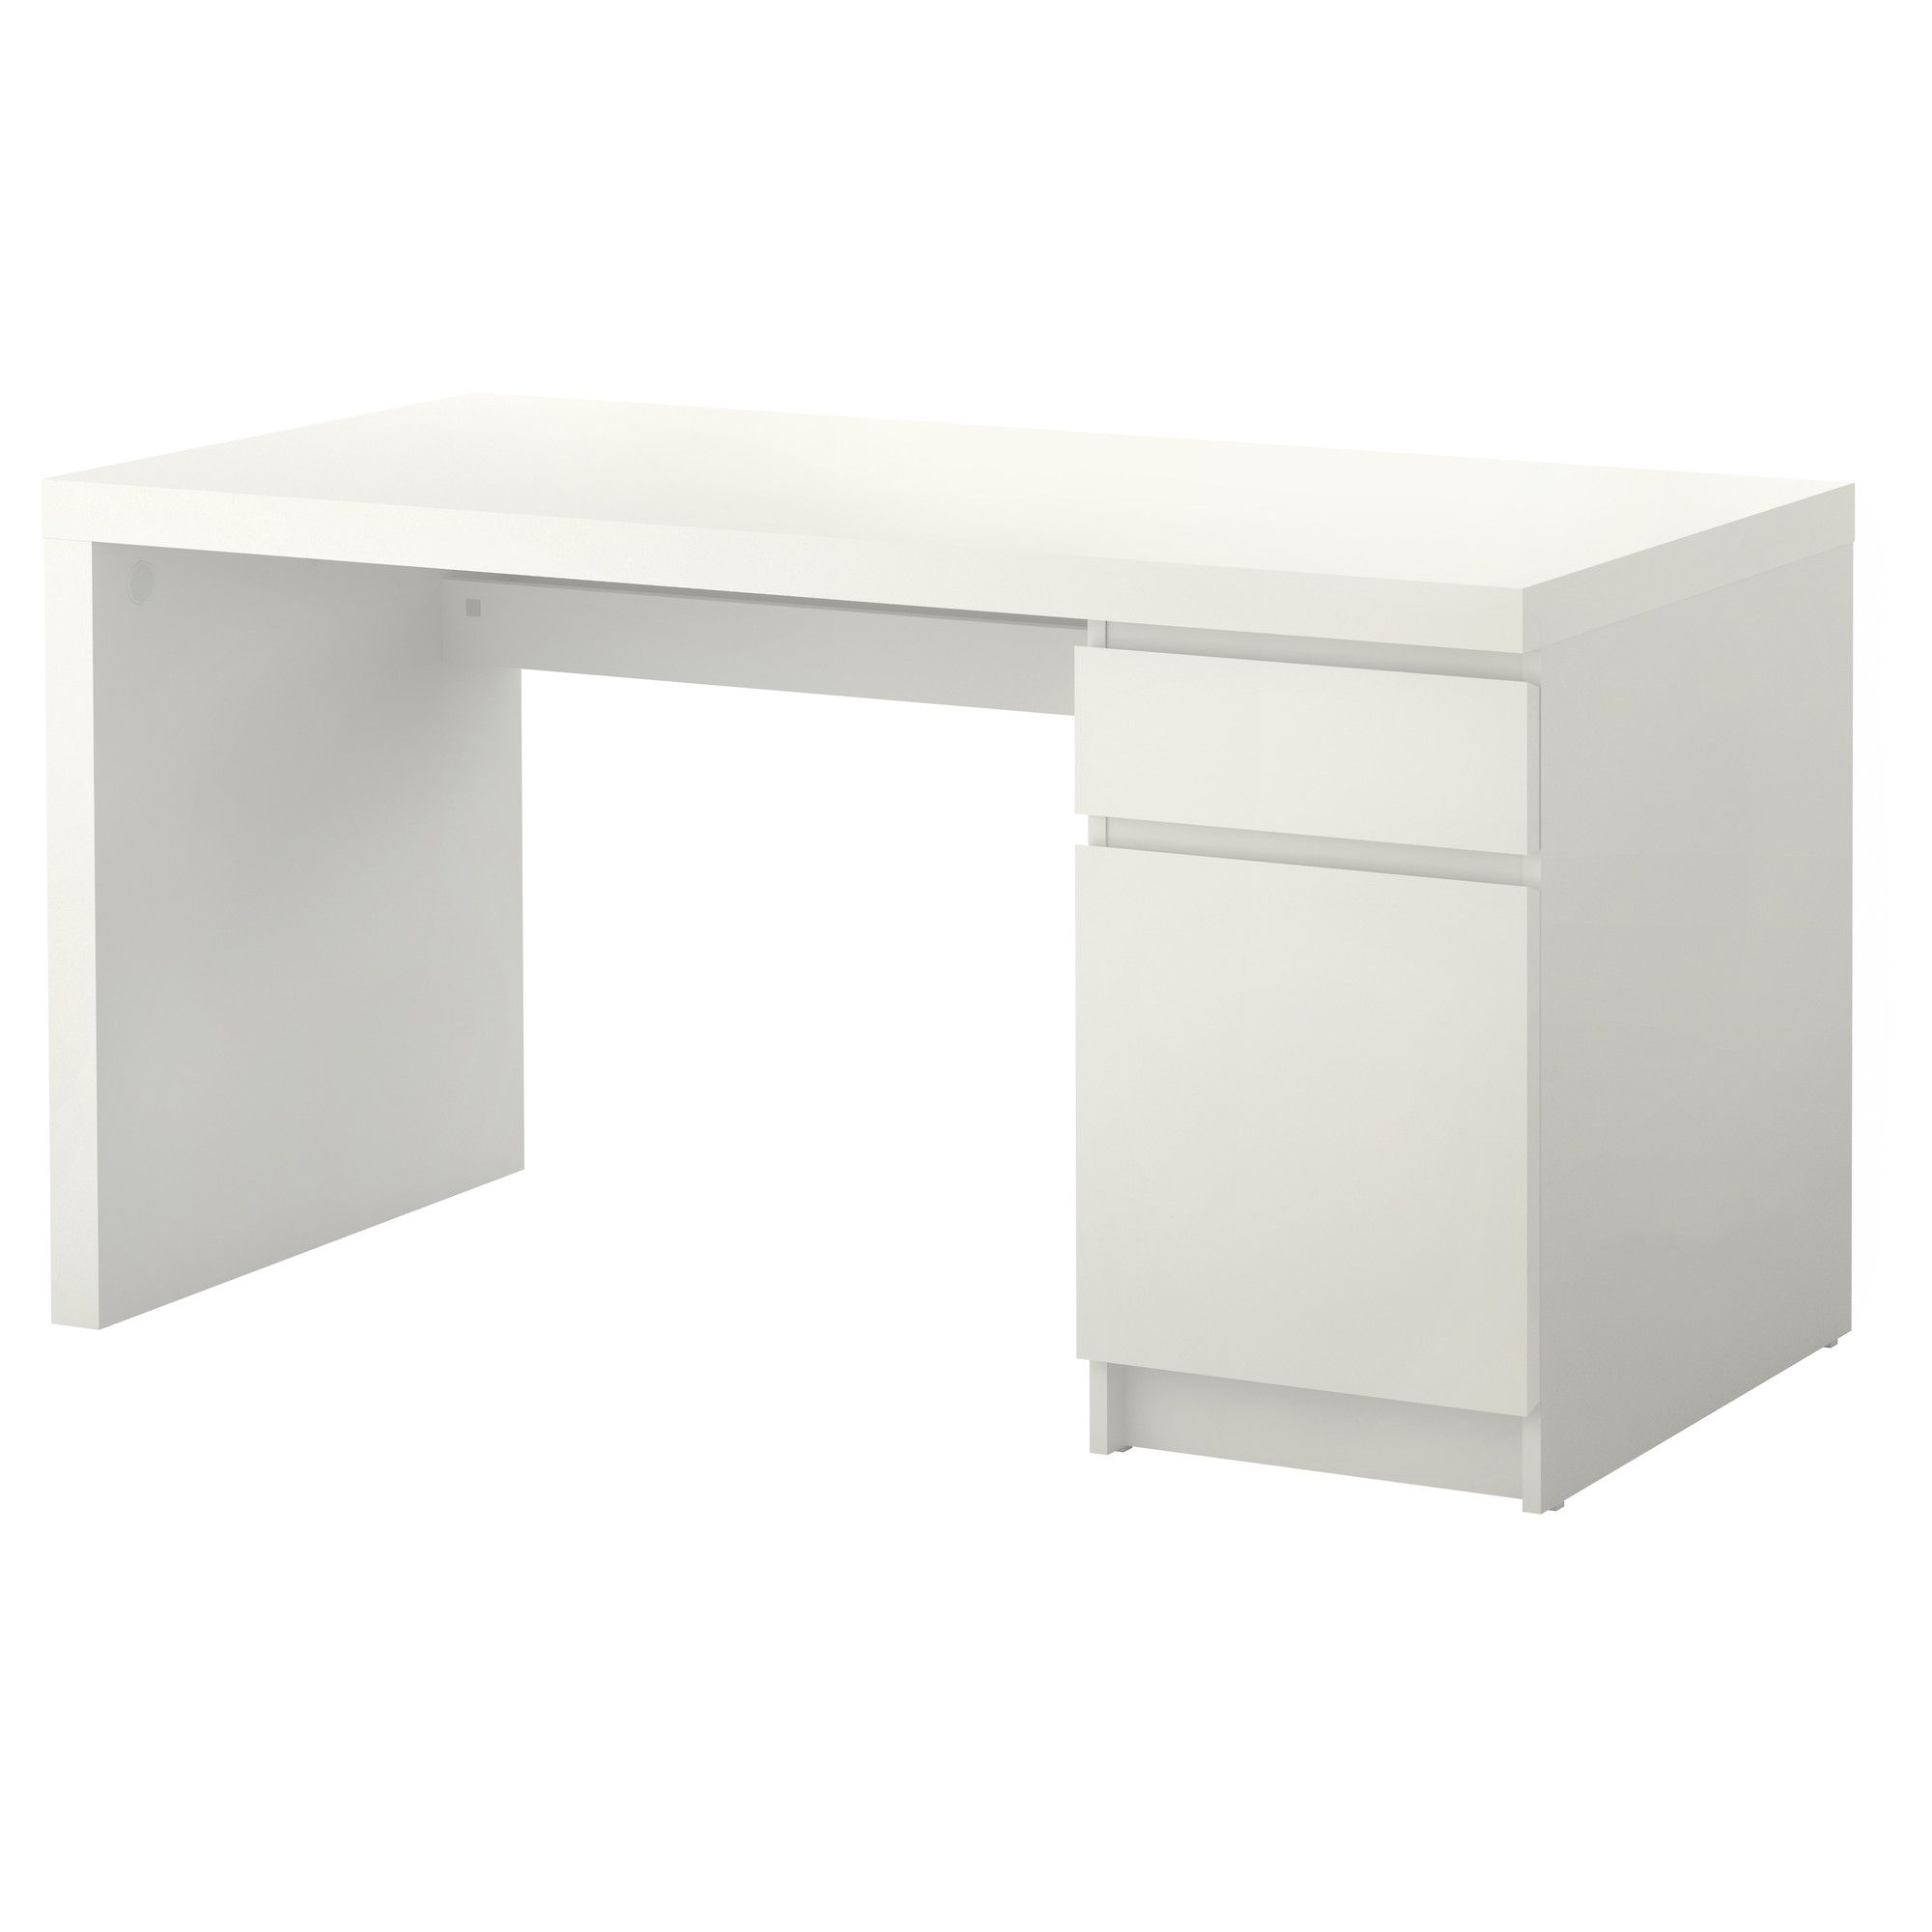 Ikea Australia Affordable Swedish Home Furniture Ikea Malm